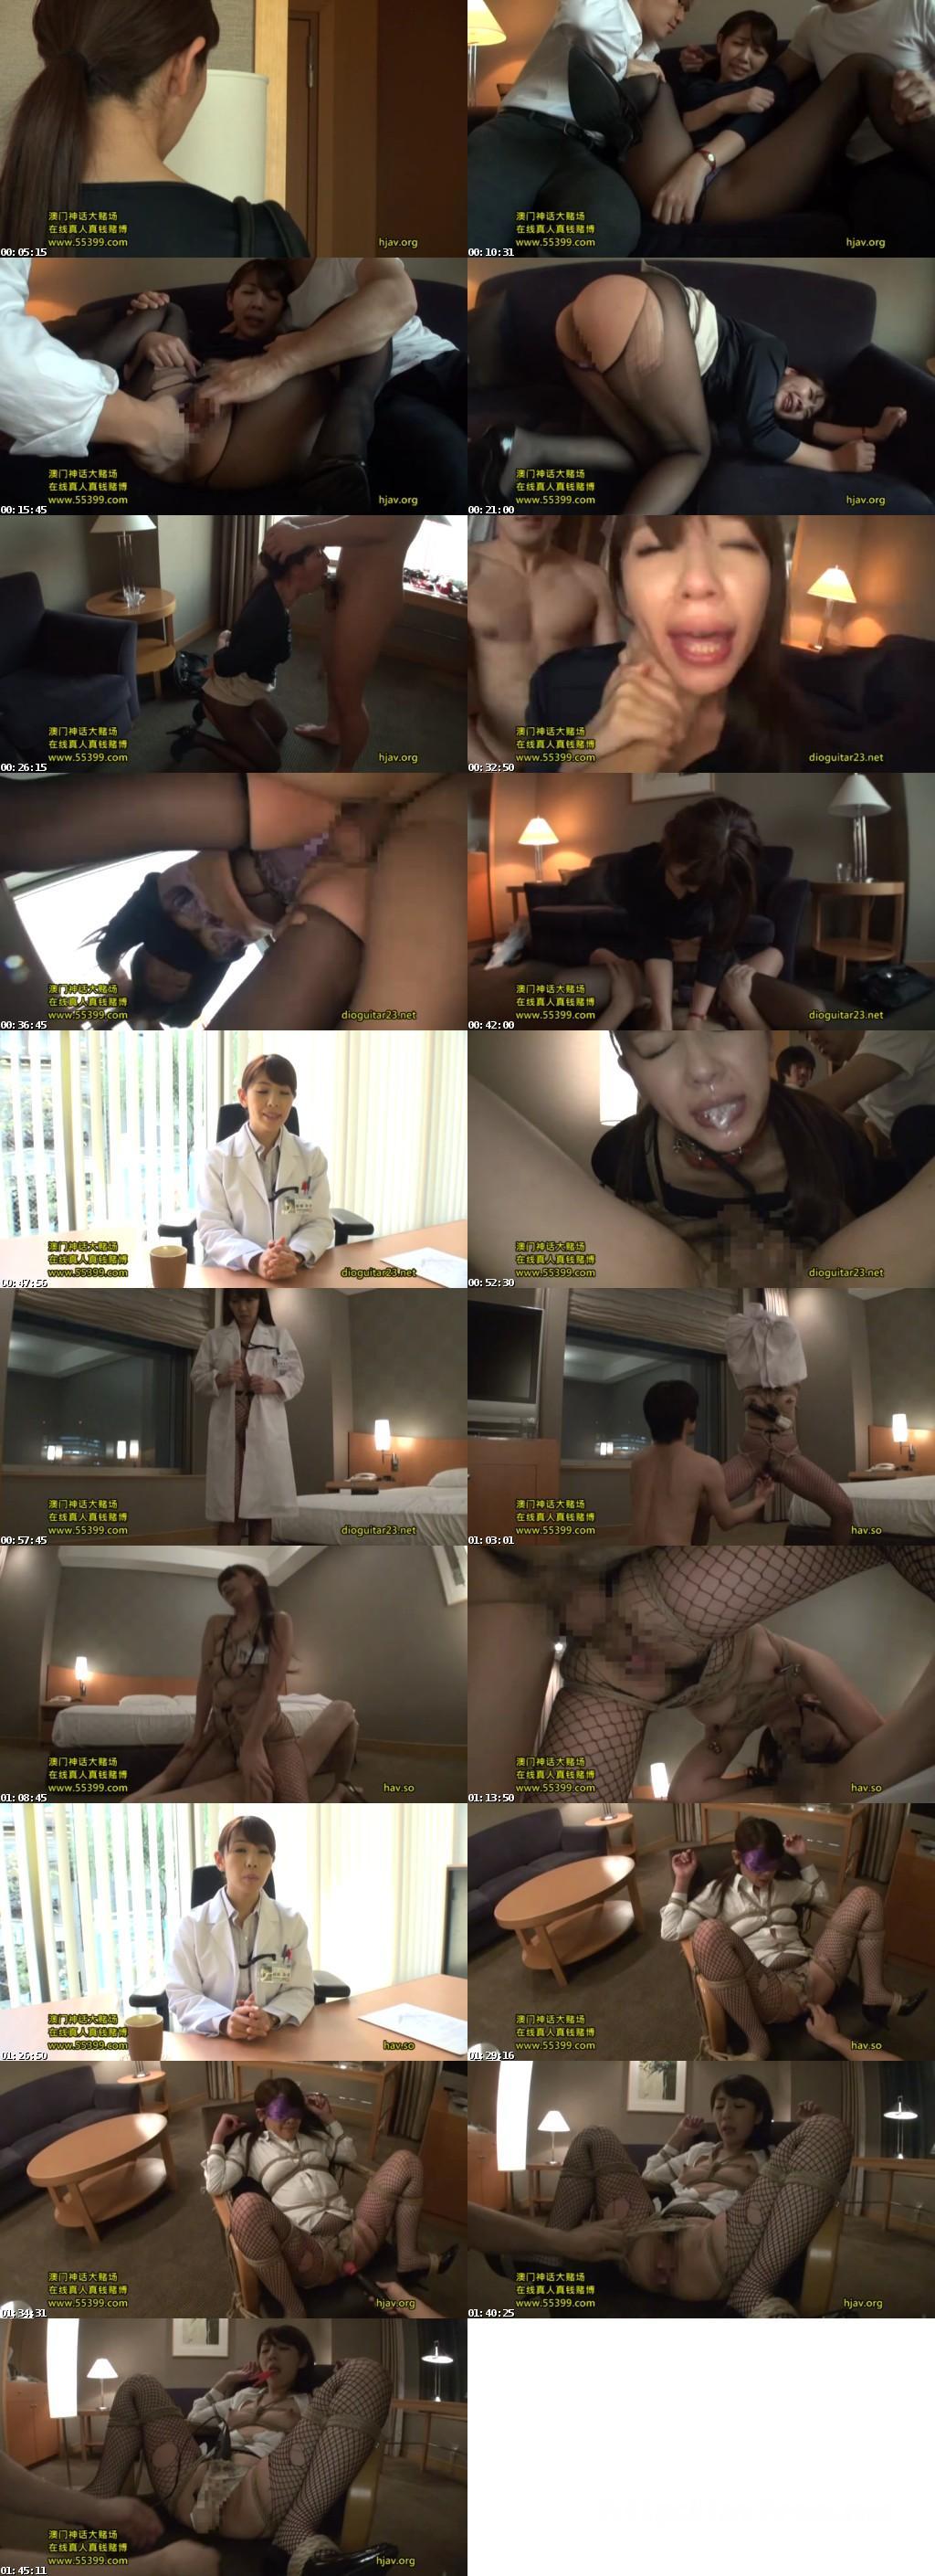 [VDD-090] 女医in… [脅迫スイートルーム] Doctor Misa(34) - image VDD-090 on https://javfree.me